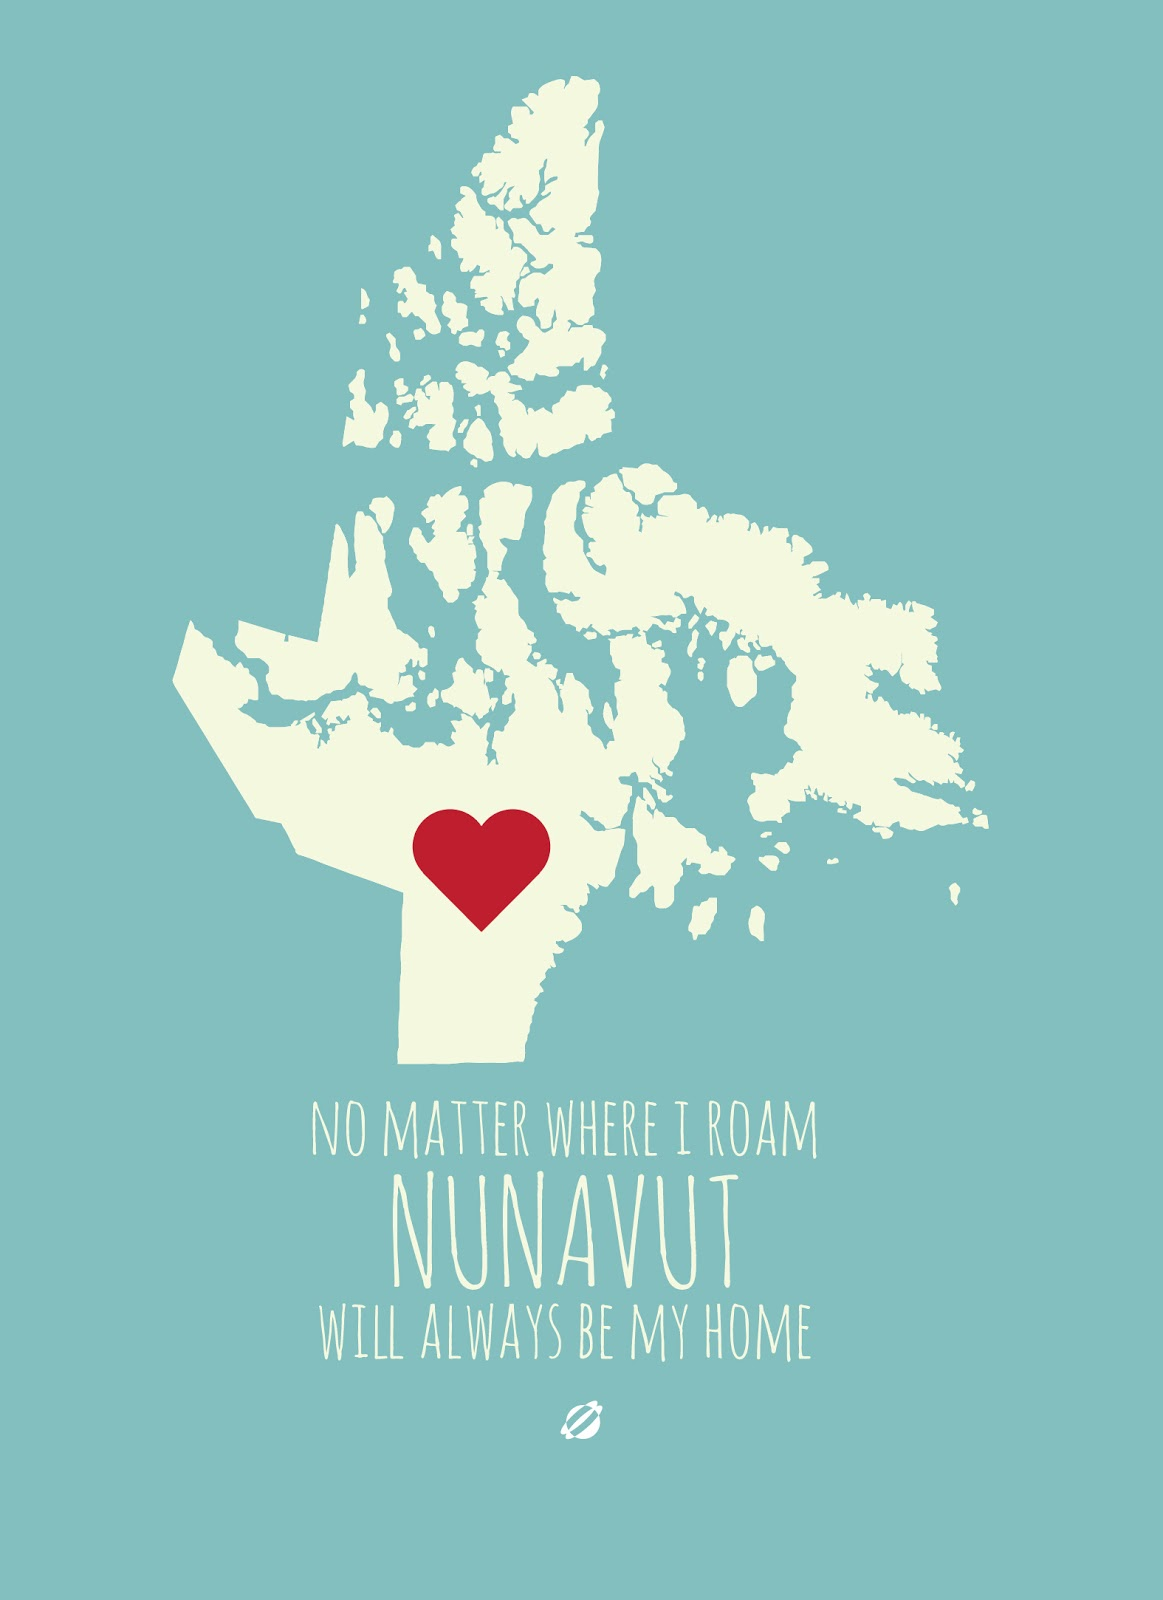 LostBumblebee 2013 Nunavut